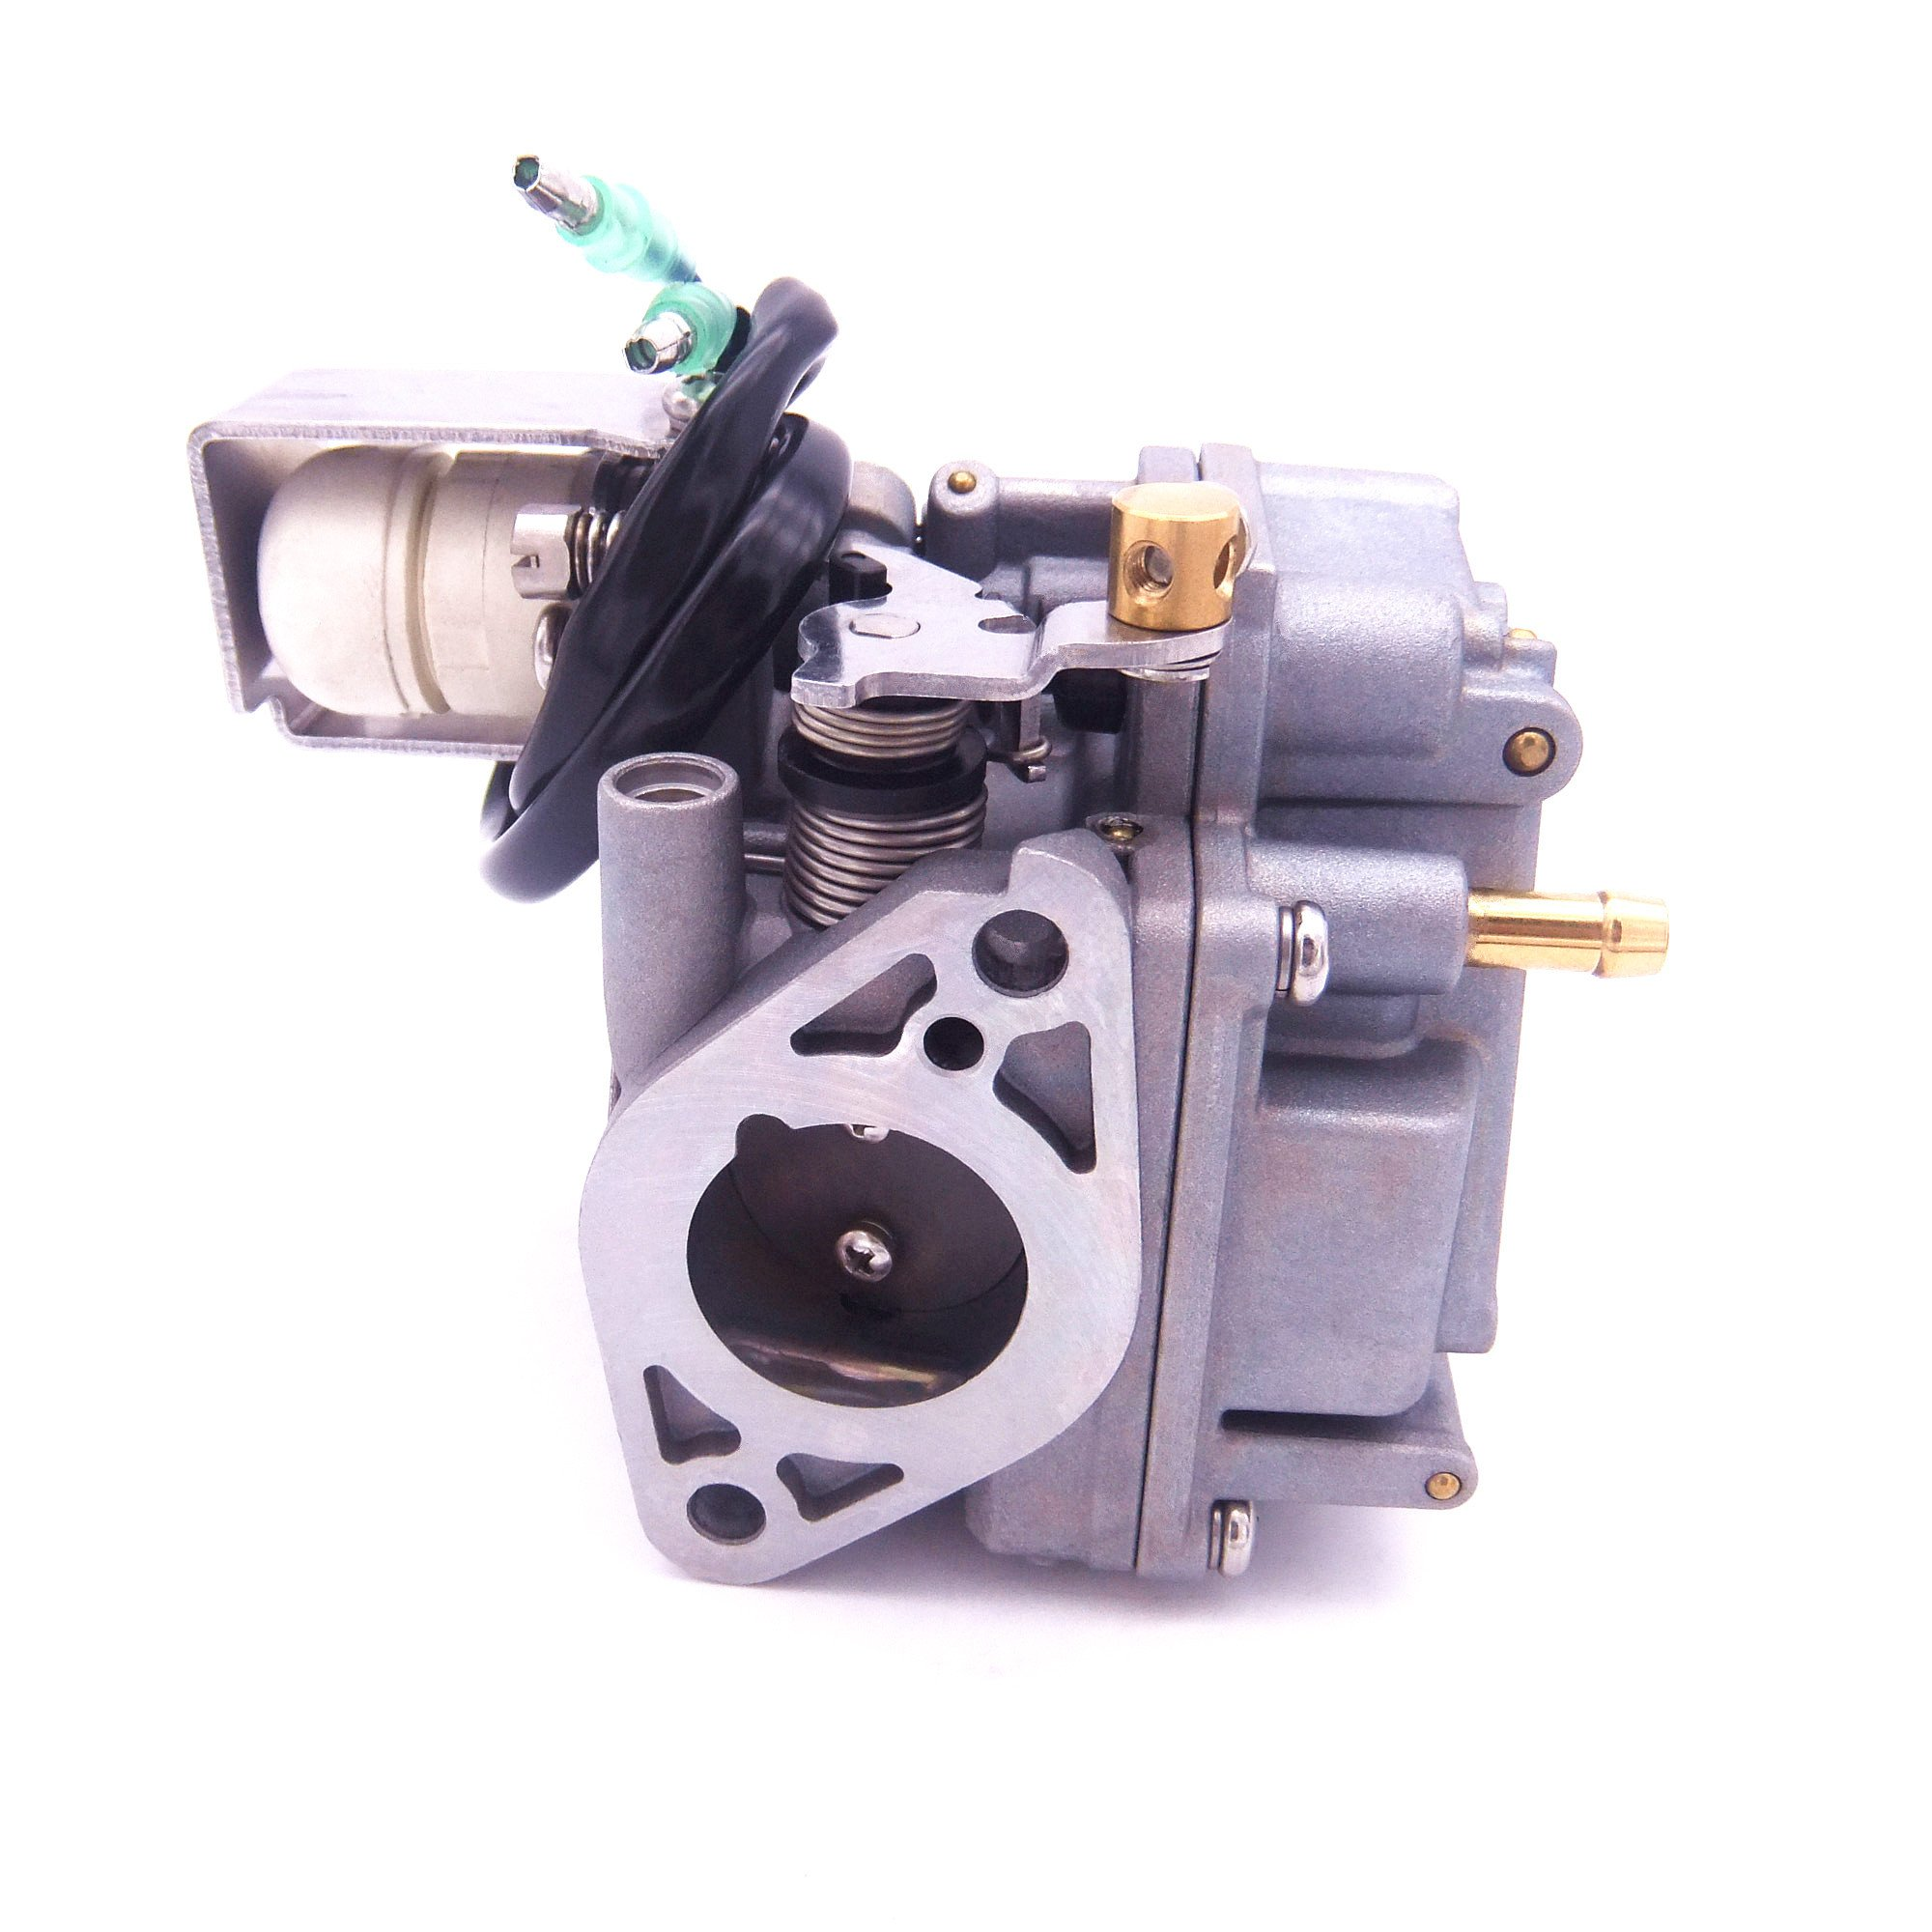 Boat Motor Carburetor Assy 6AH-14301-00 6AH-14301-01 for Yamaha 4-stroke F20 Outboard Engine